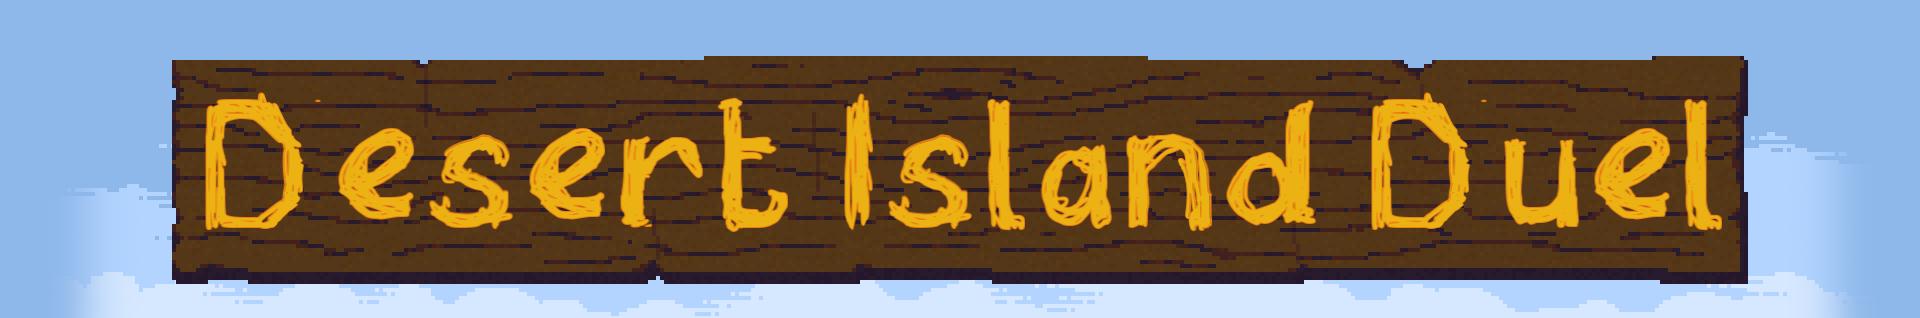 Desert Island Duel